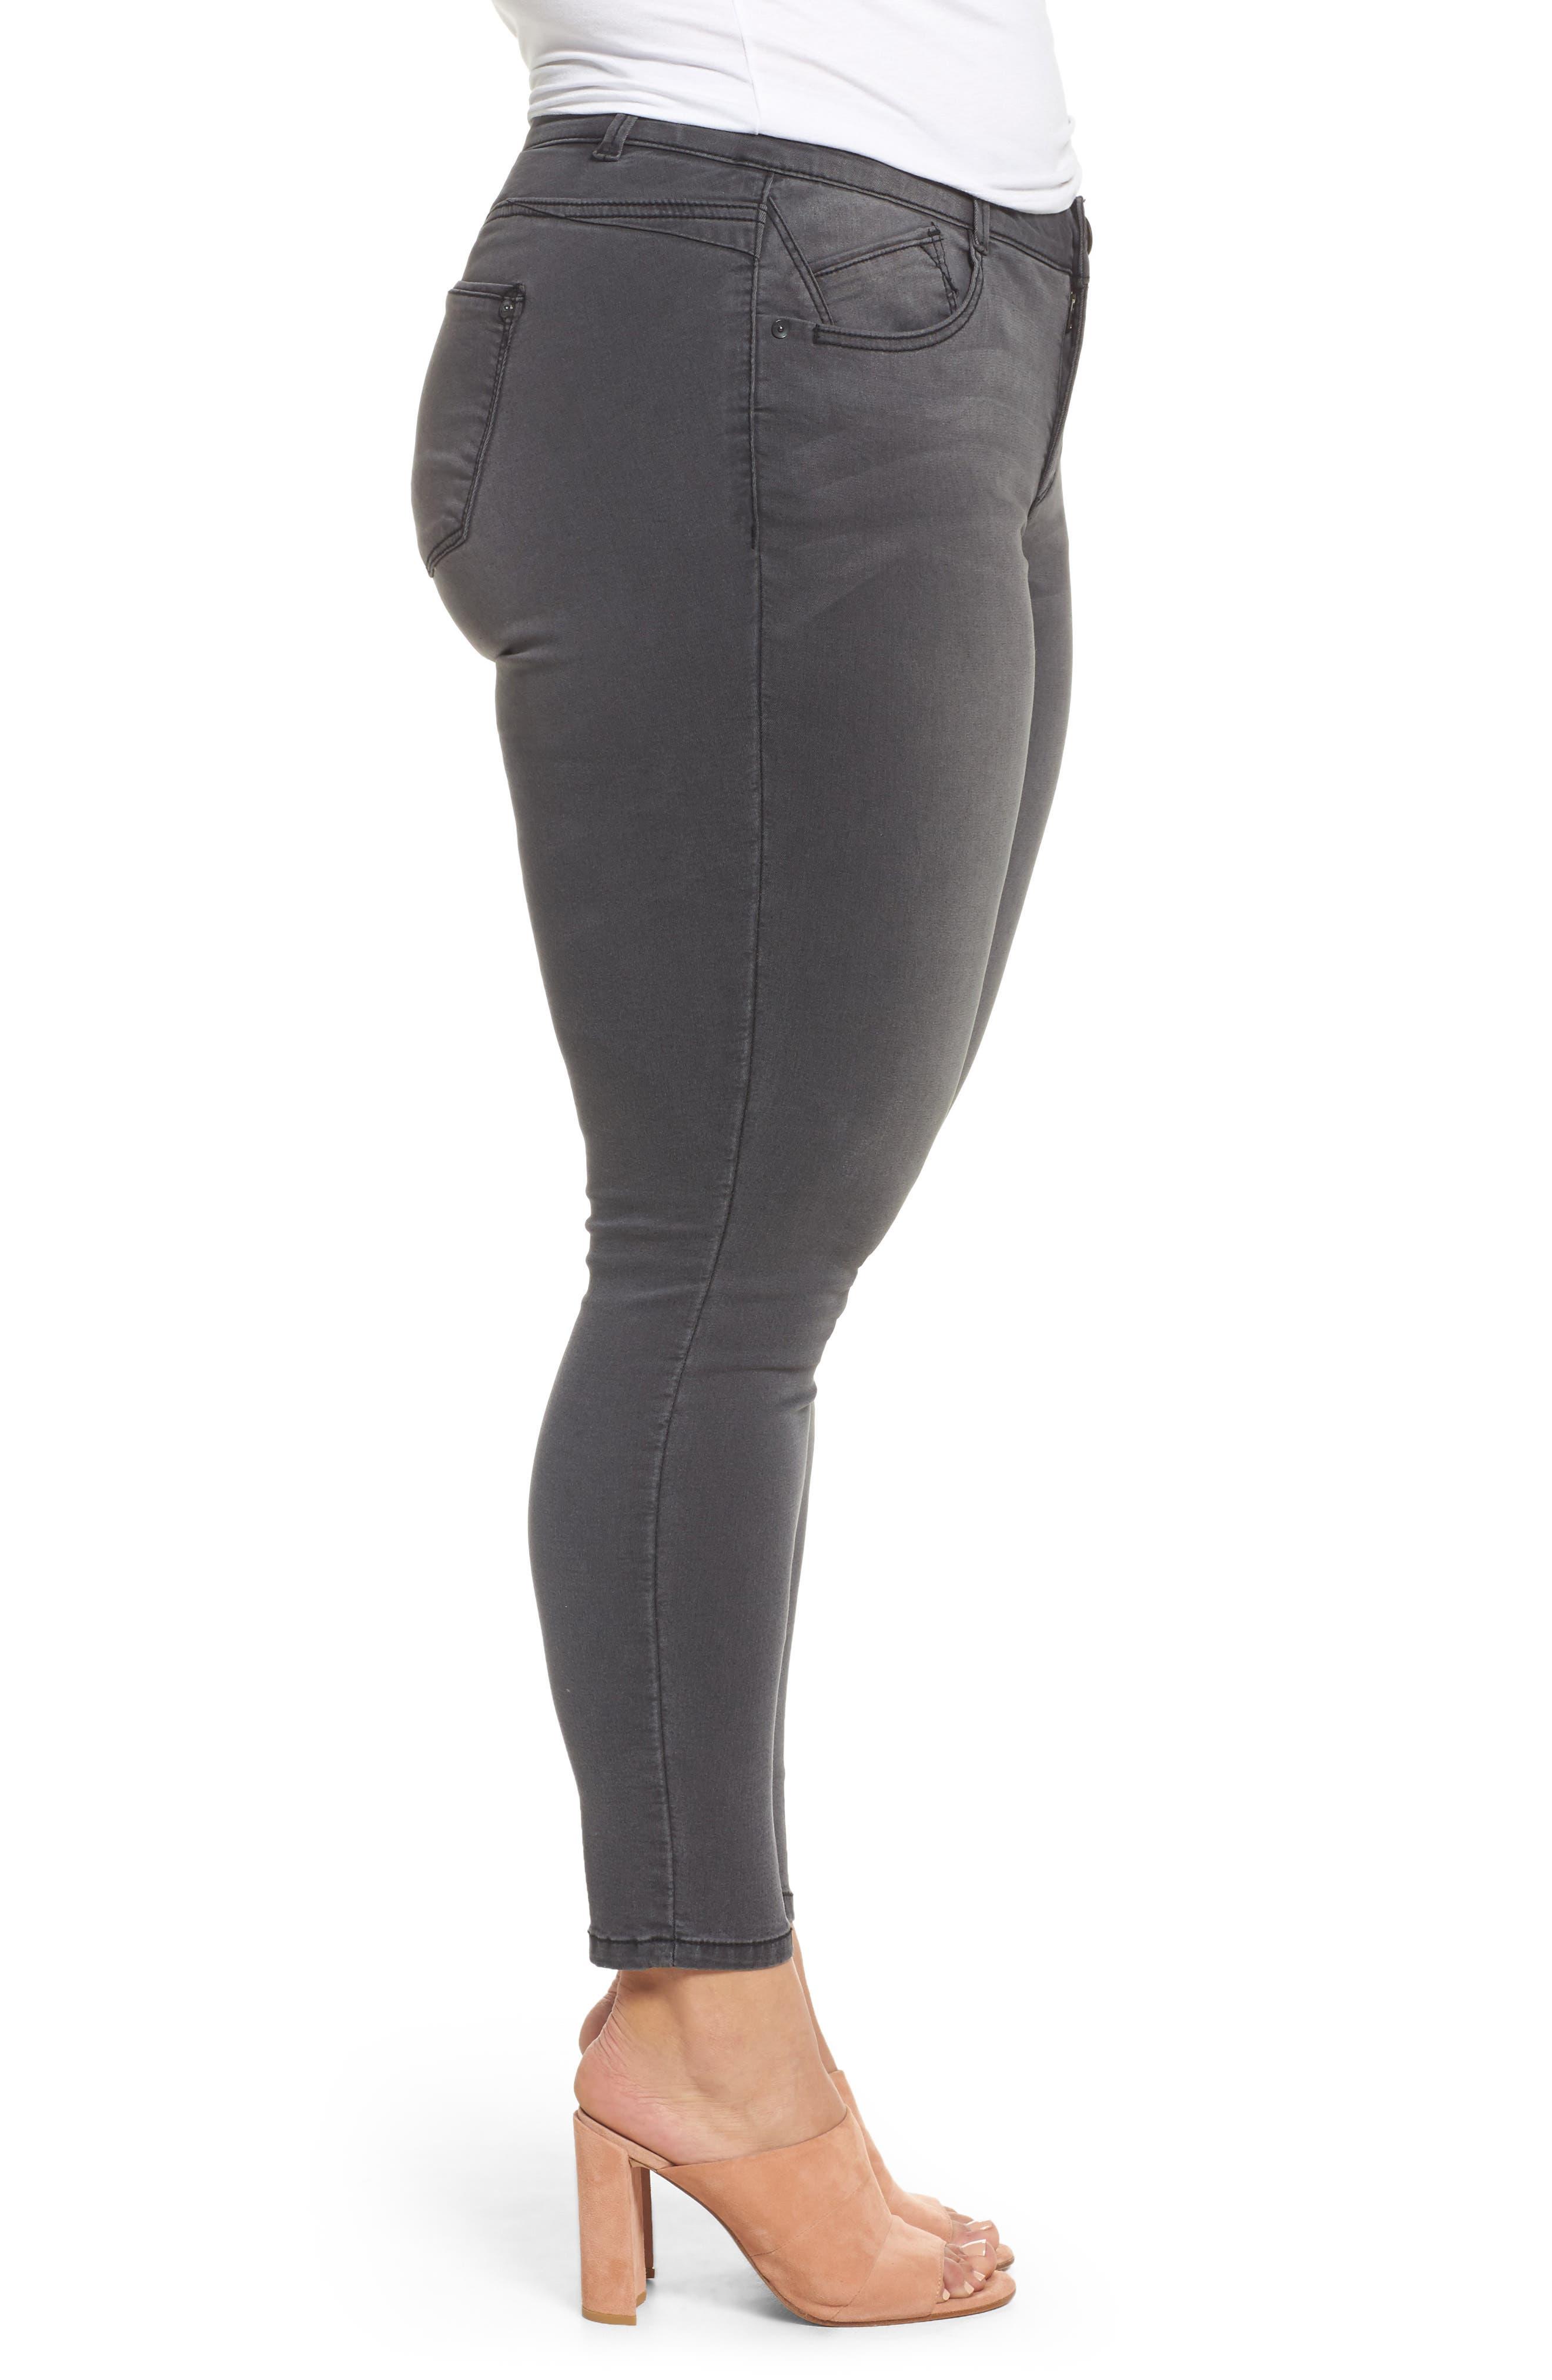 Ab-solution Ankle Skimmer Jeans,                             Alternate thumbnail 3, color,                             020